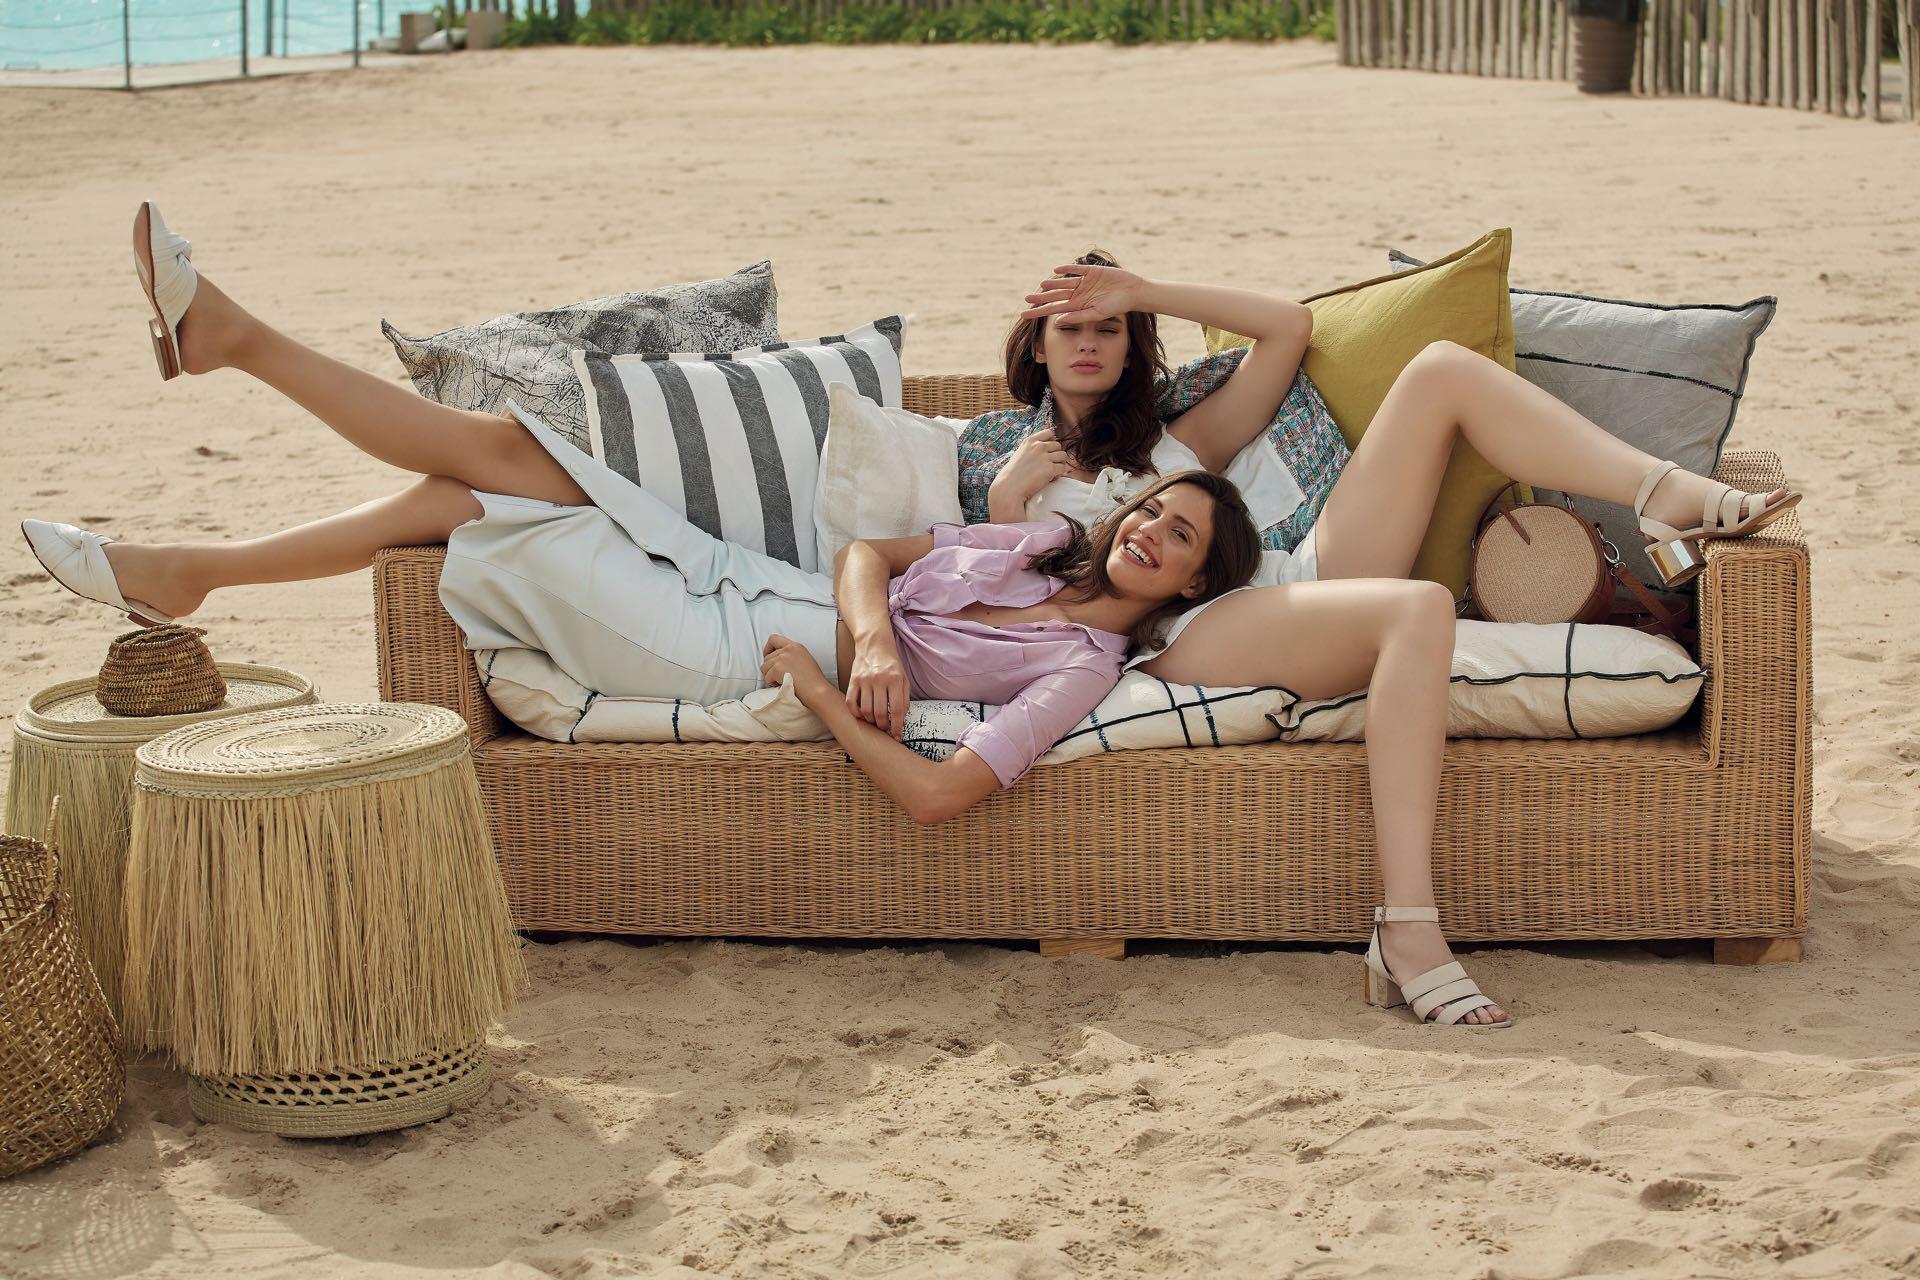 Luisi: camisa de poplín(Ted Bodin), pollera de cuero(Cher) y slippers de cuero($ 6.500, Carmela Achaval).Stefi: mono con glitter($ 1.940, Zhoue), sandalias de gamuza con pulsera($ 6.749, Paruolo) ybandolera de rafia con cuero ($ 4.250, Sofi Martiré).